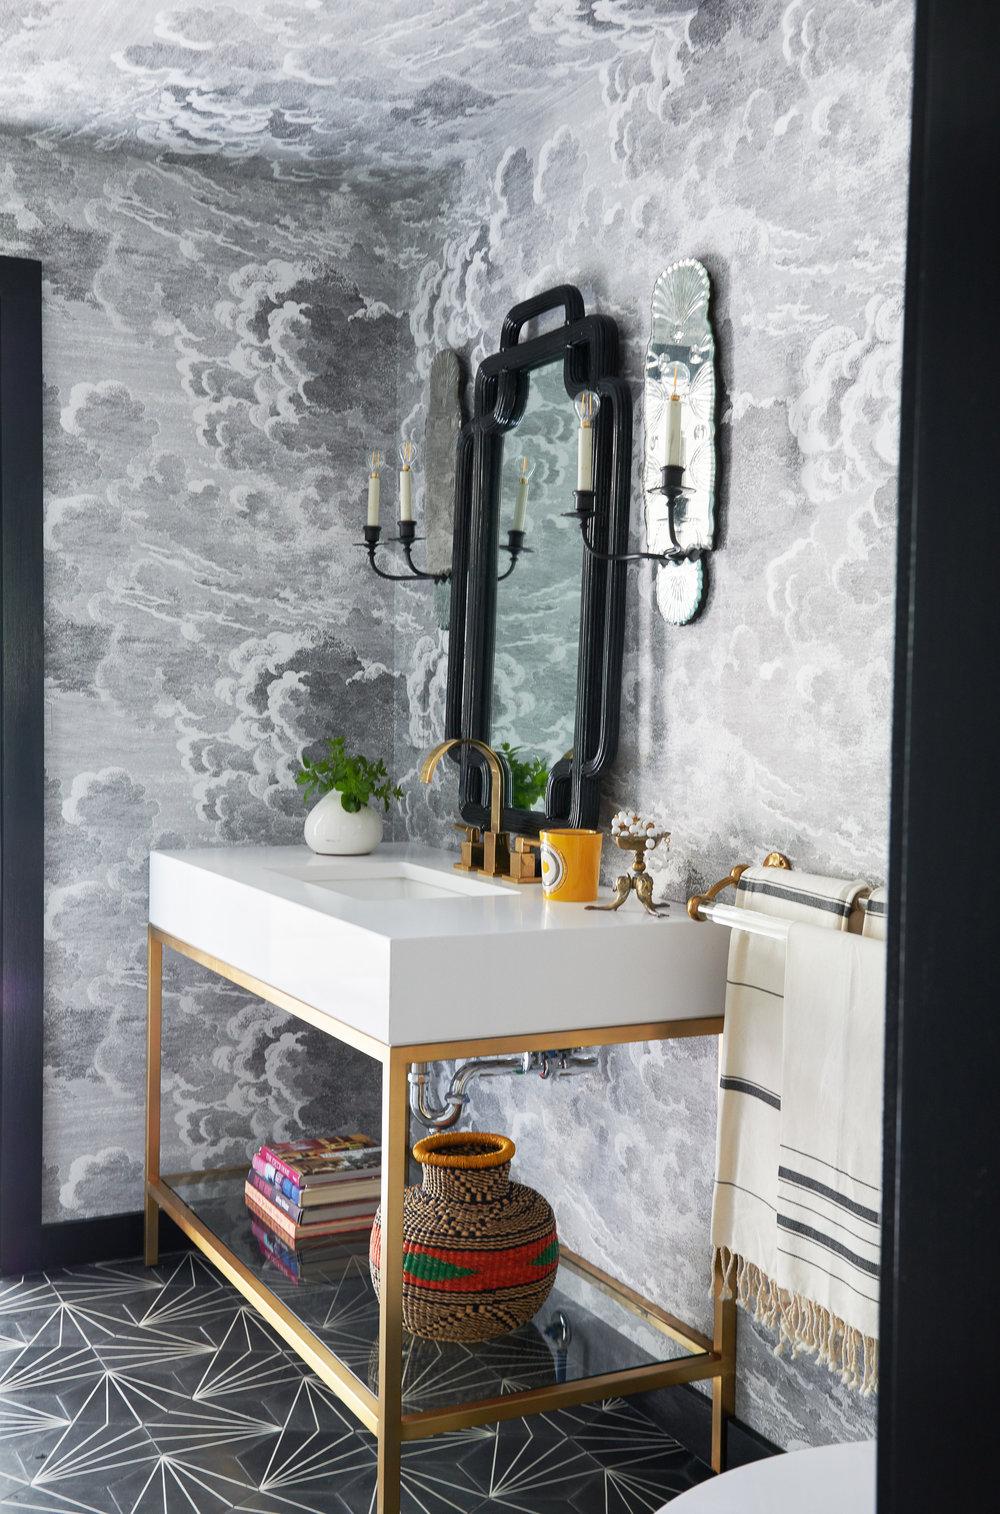 Lyon-Field-design-interior-design-powder-room-wallpaper-©Jane Beiles-18084604.jpg